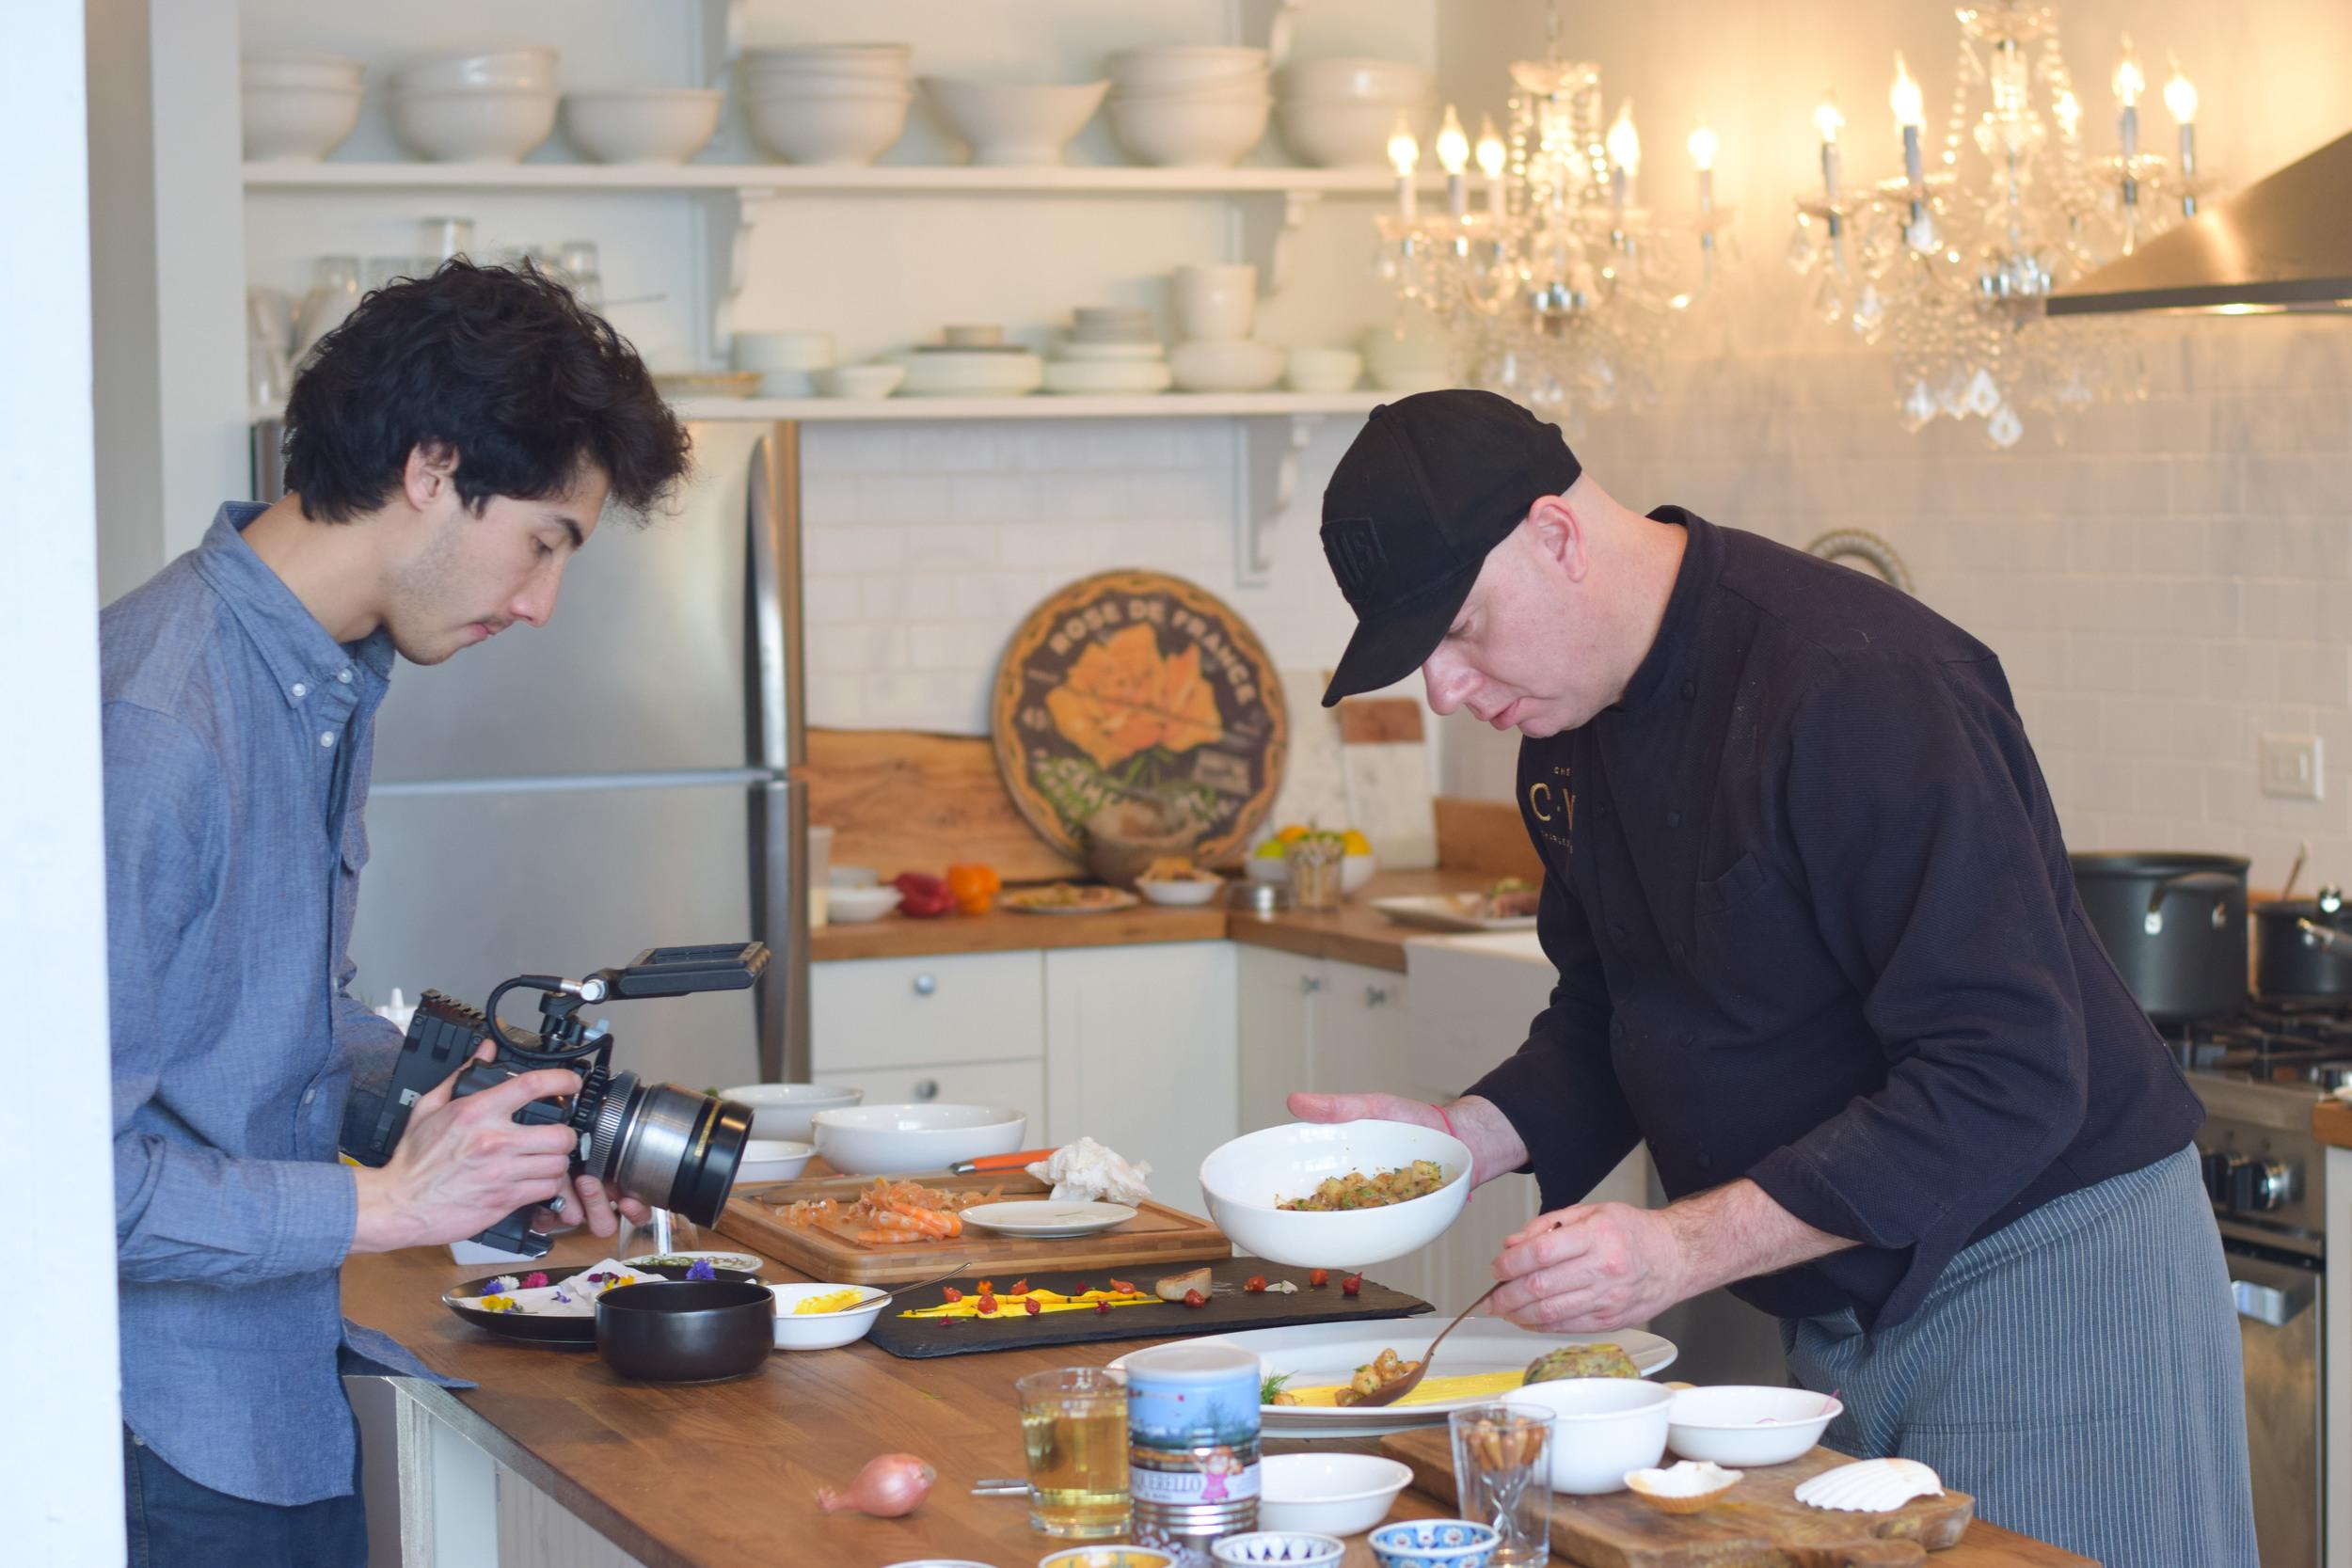 Eric Formato Formatografia photography Maura Gaughan Video Production Entreprenuership Charles Webb Chef Culinary Art -83.jpg